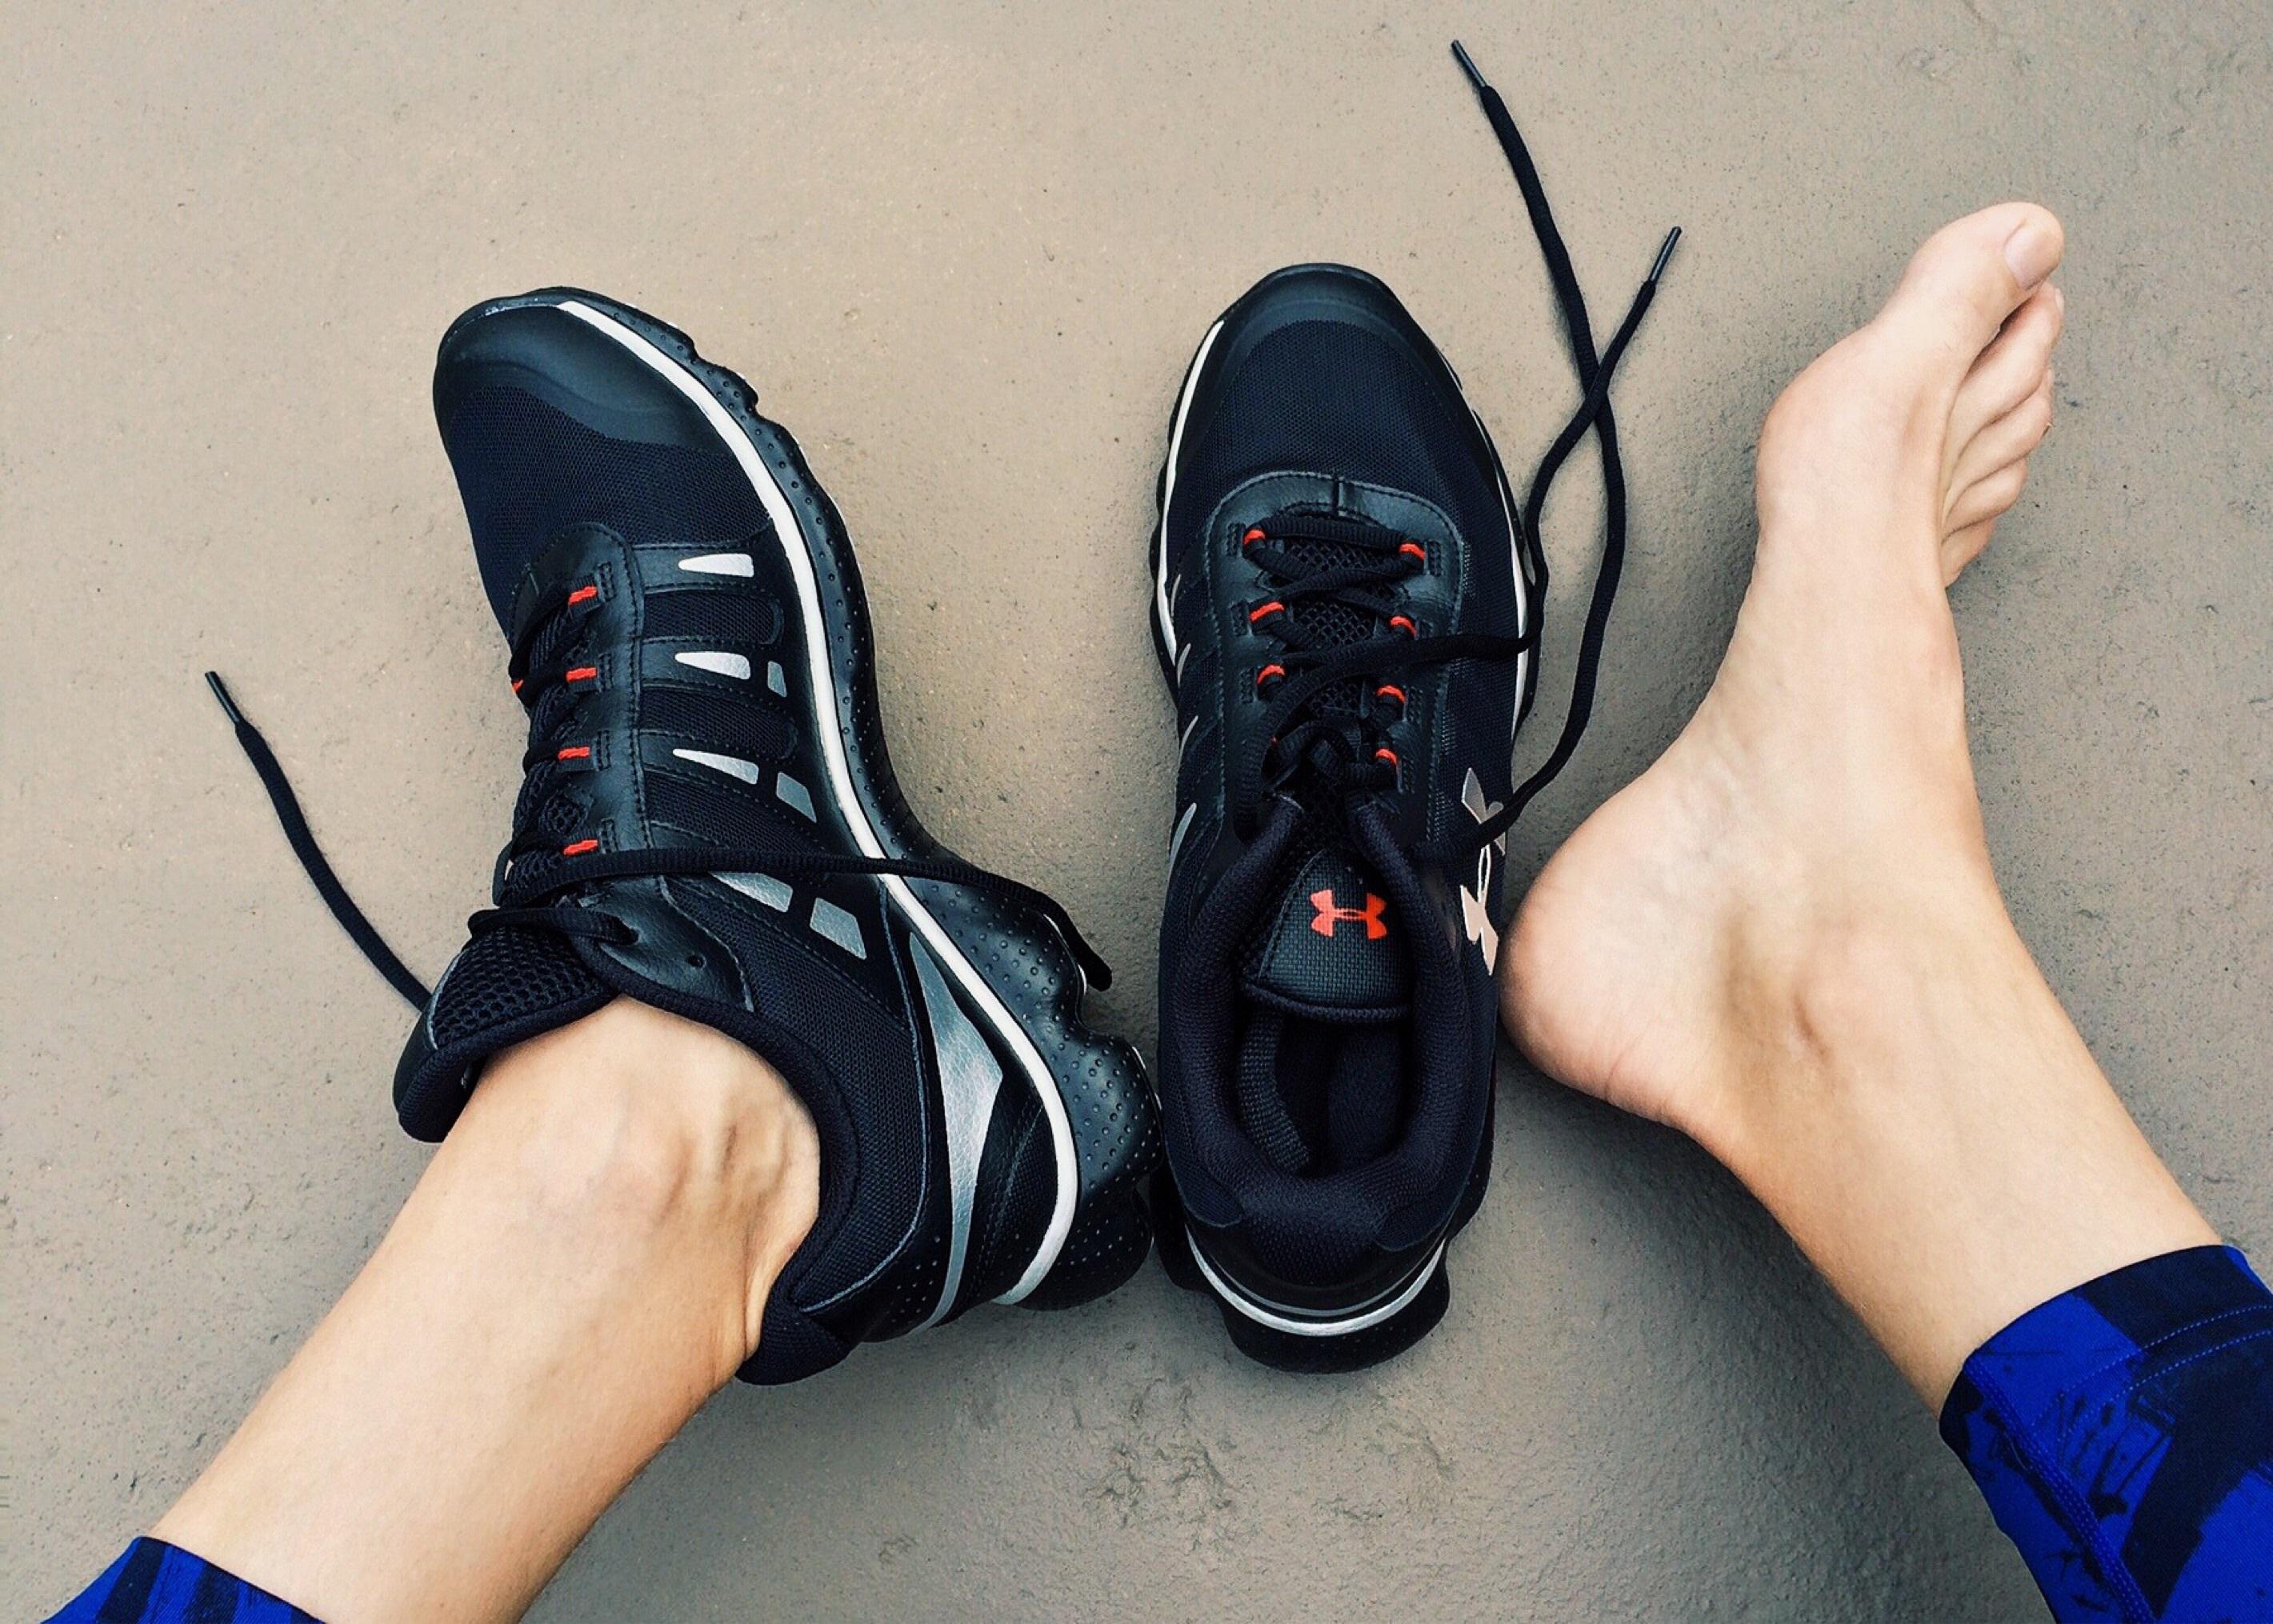 Plantar Fasciitis Pain, Heel Pain, Foot Pain While Running, Running with Plantar Fasciitis, Plantar Fasciitis in Runners